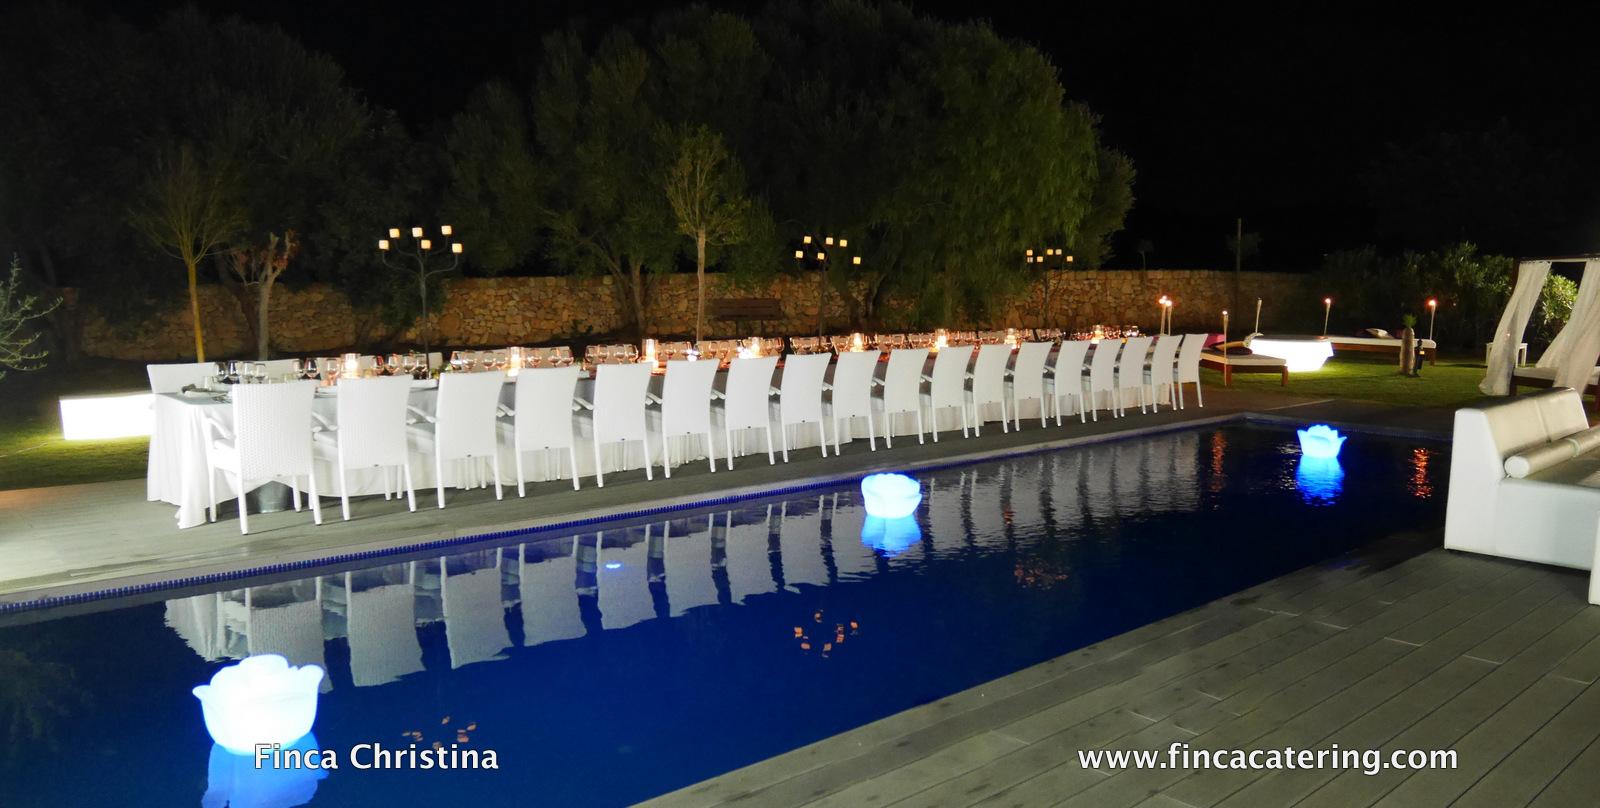 02 Finca Catering 10 16 2014 26 - Property Cristina